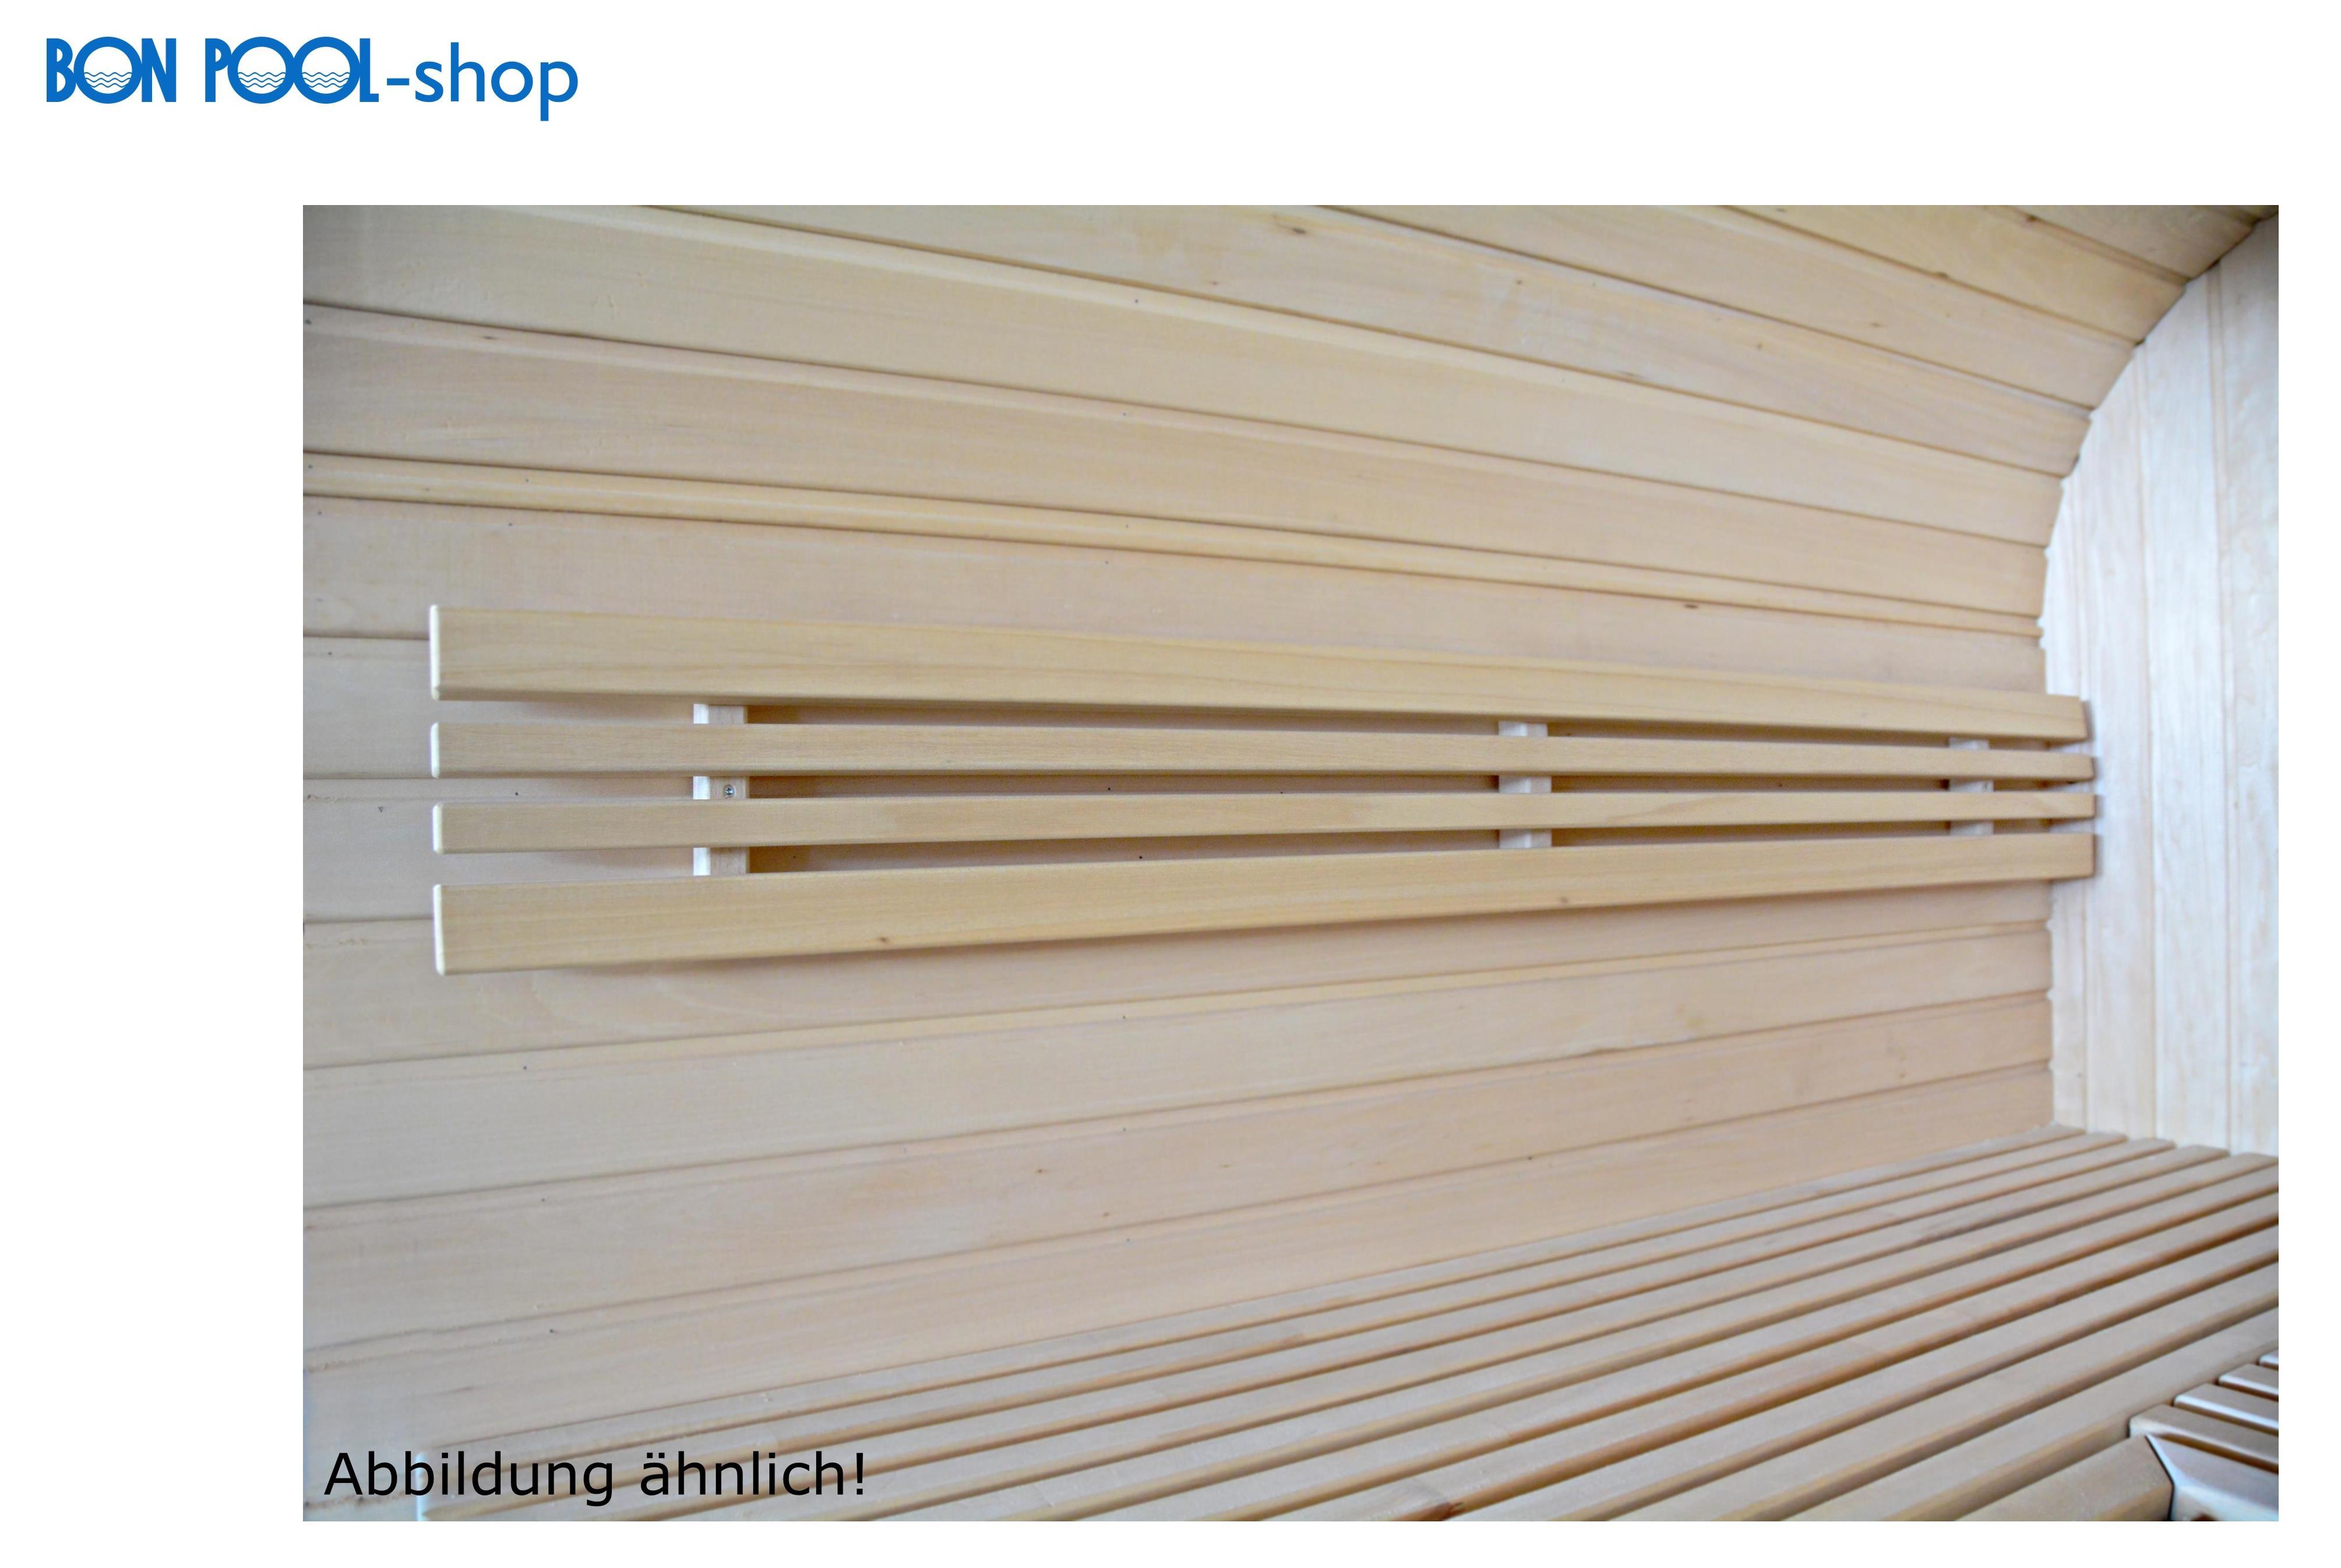 sauna r ckenlehne abachi 80x20cm oder nach anfrage. Black Bedroom Furniture Sets. Home Design Ideas